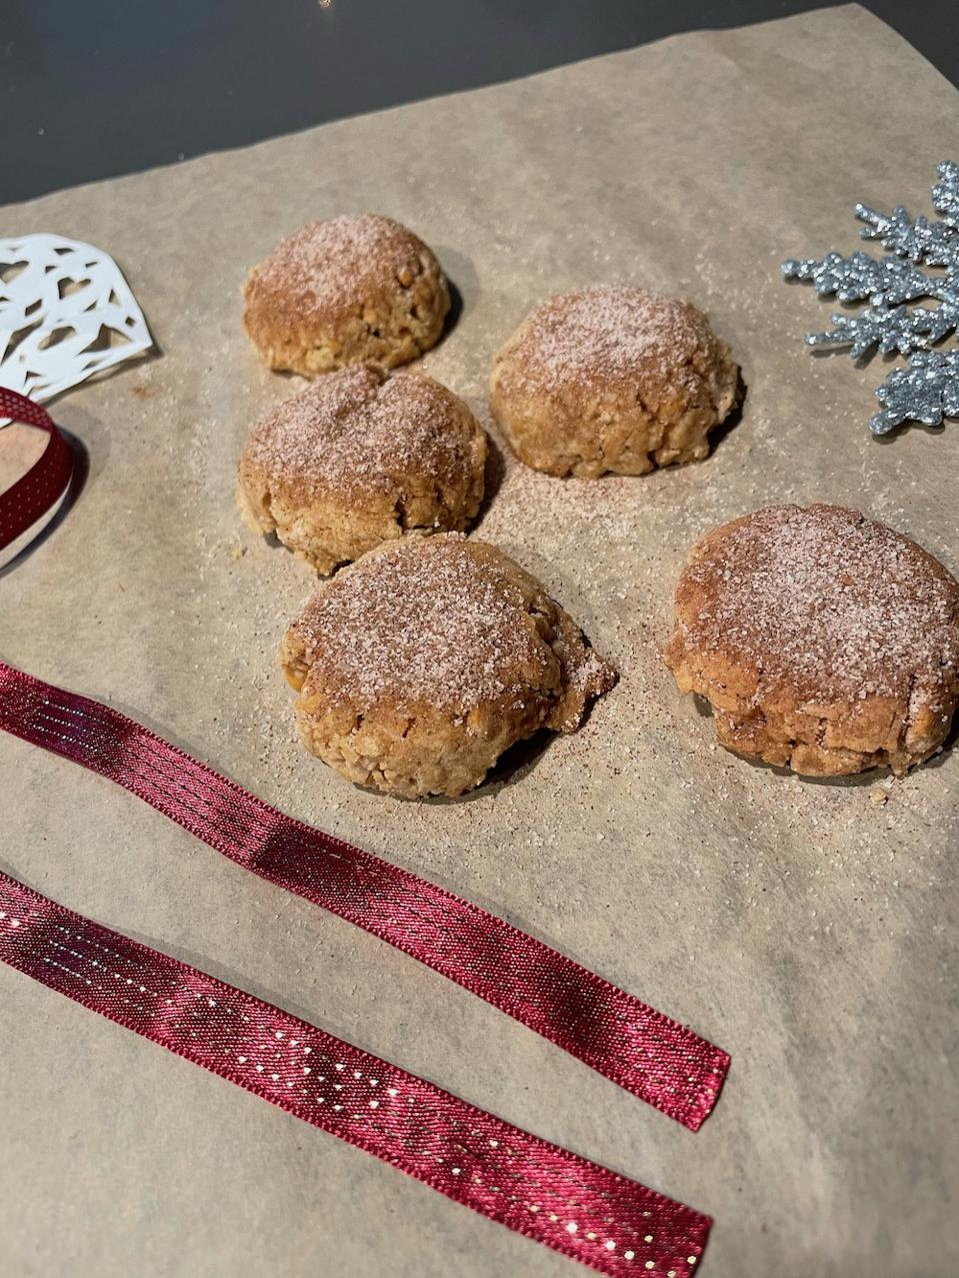 Canelitas Mexican Christmas Cookies